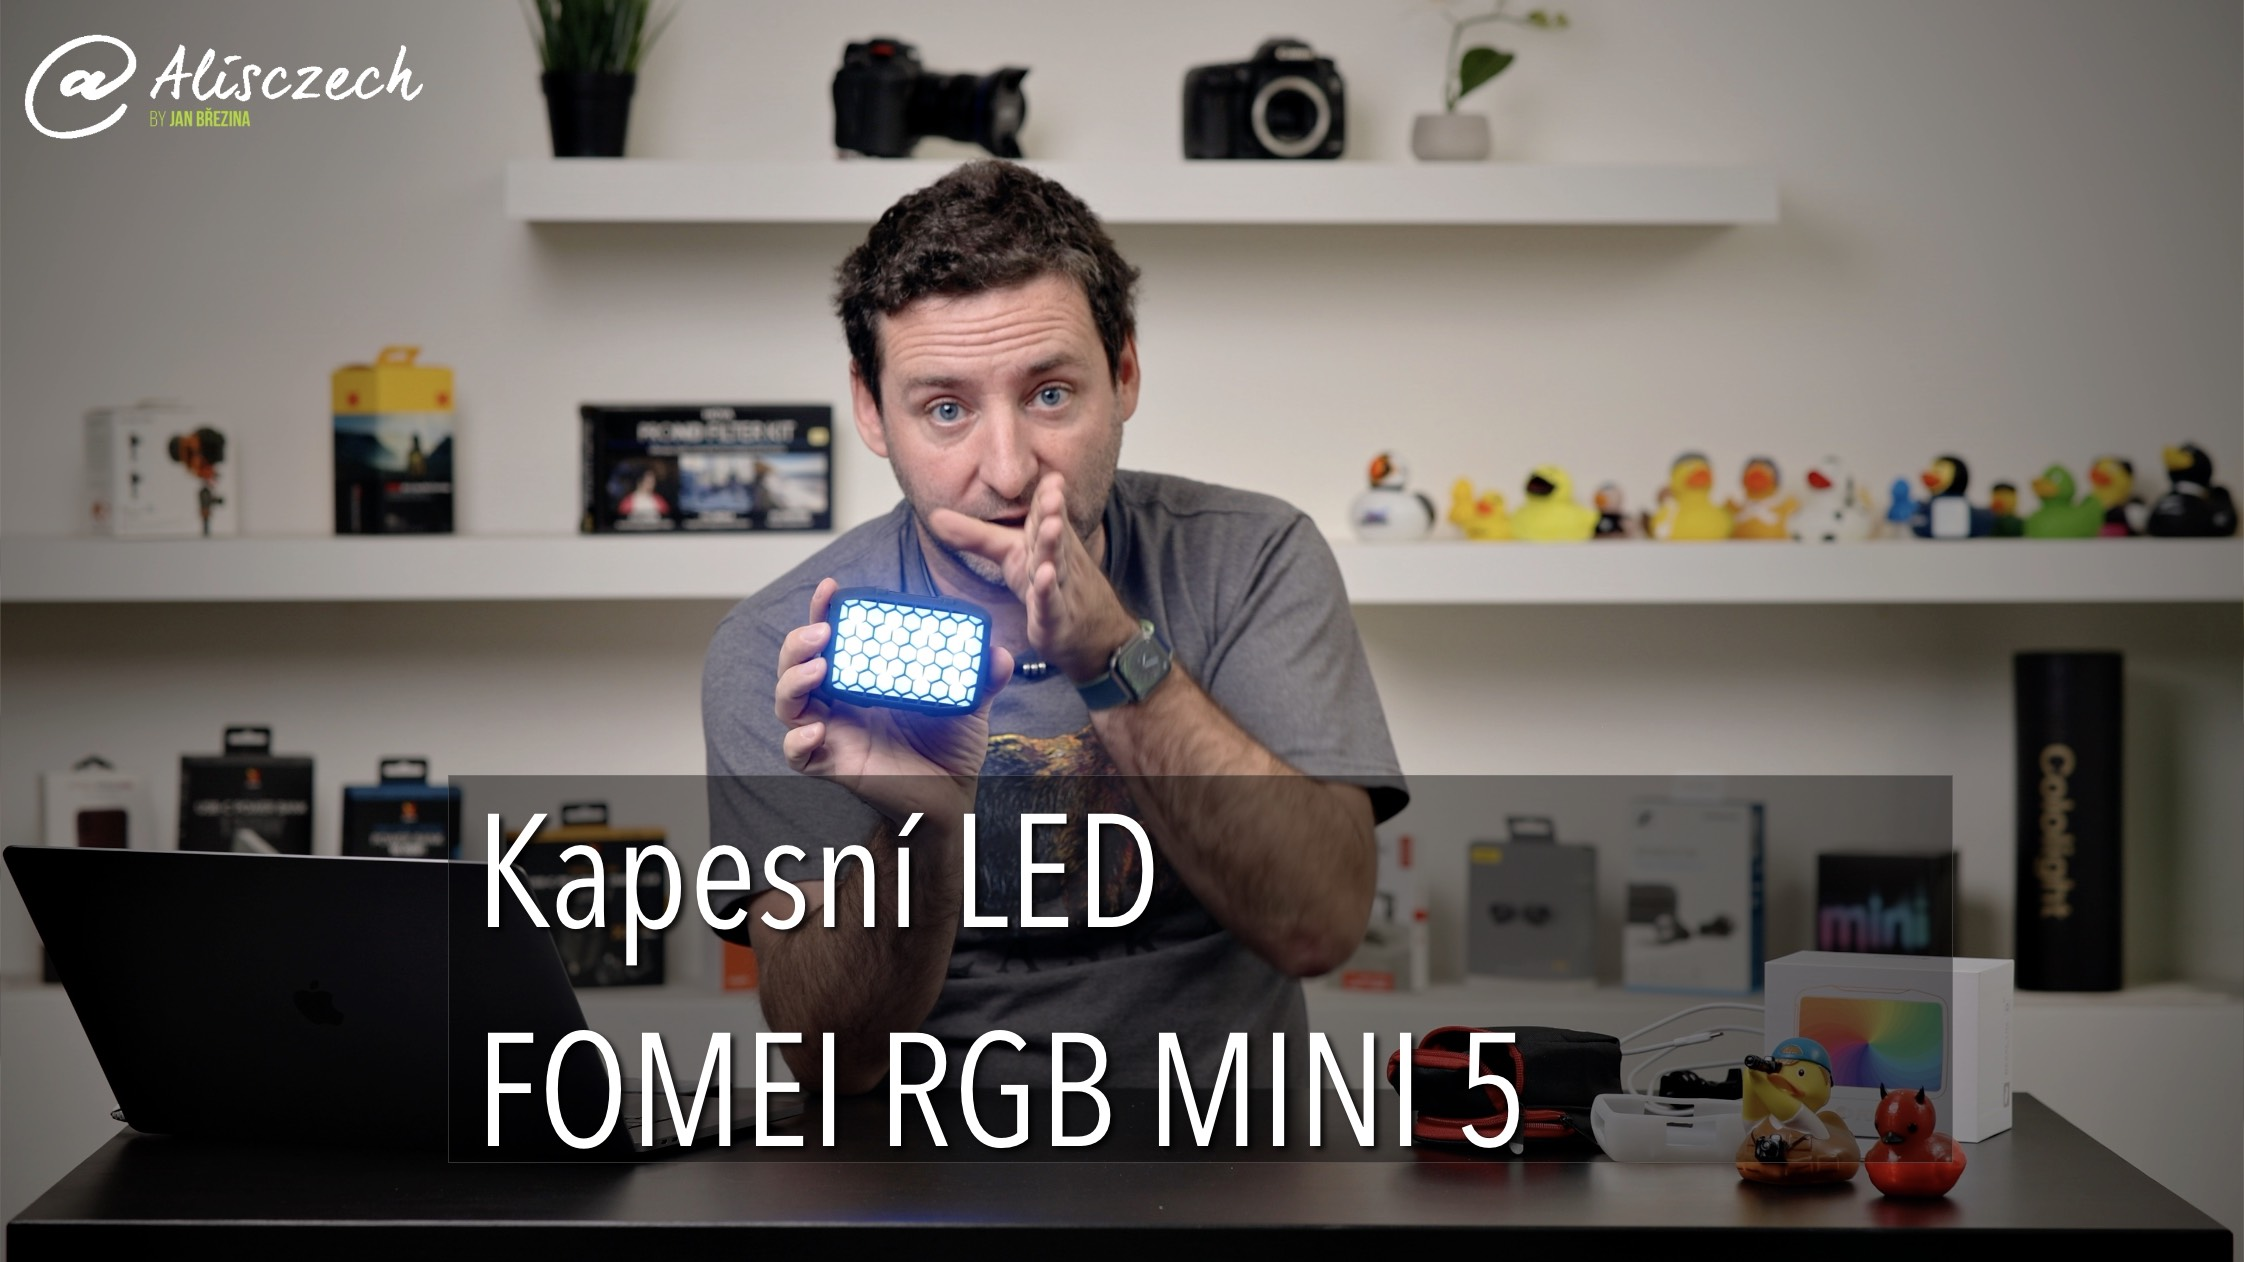 Fomei LED RGB Mini 5